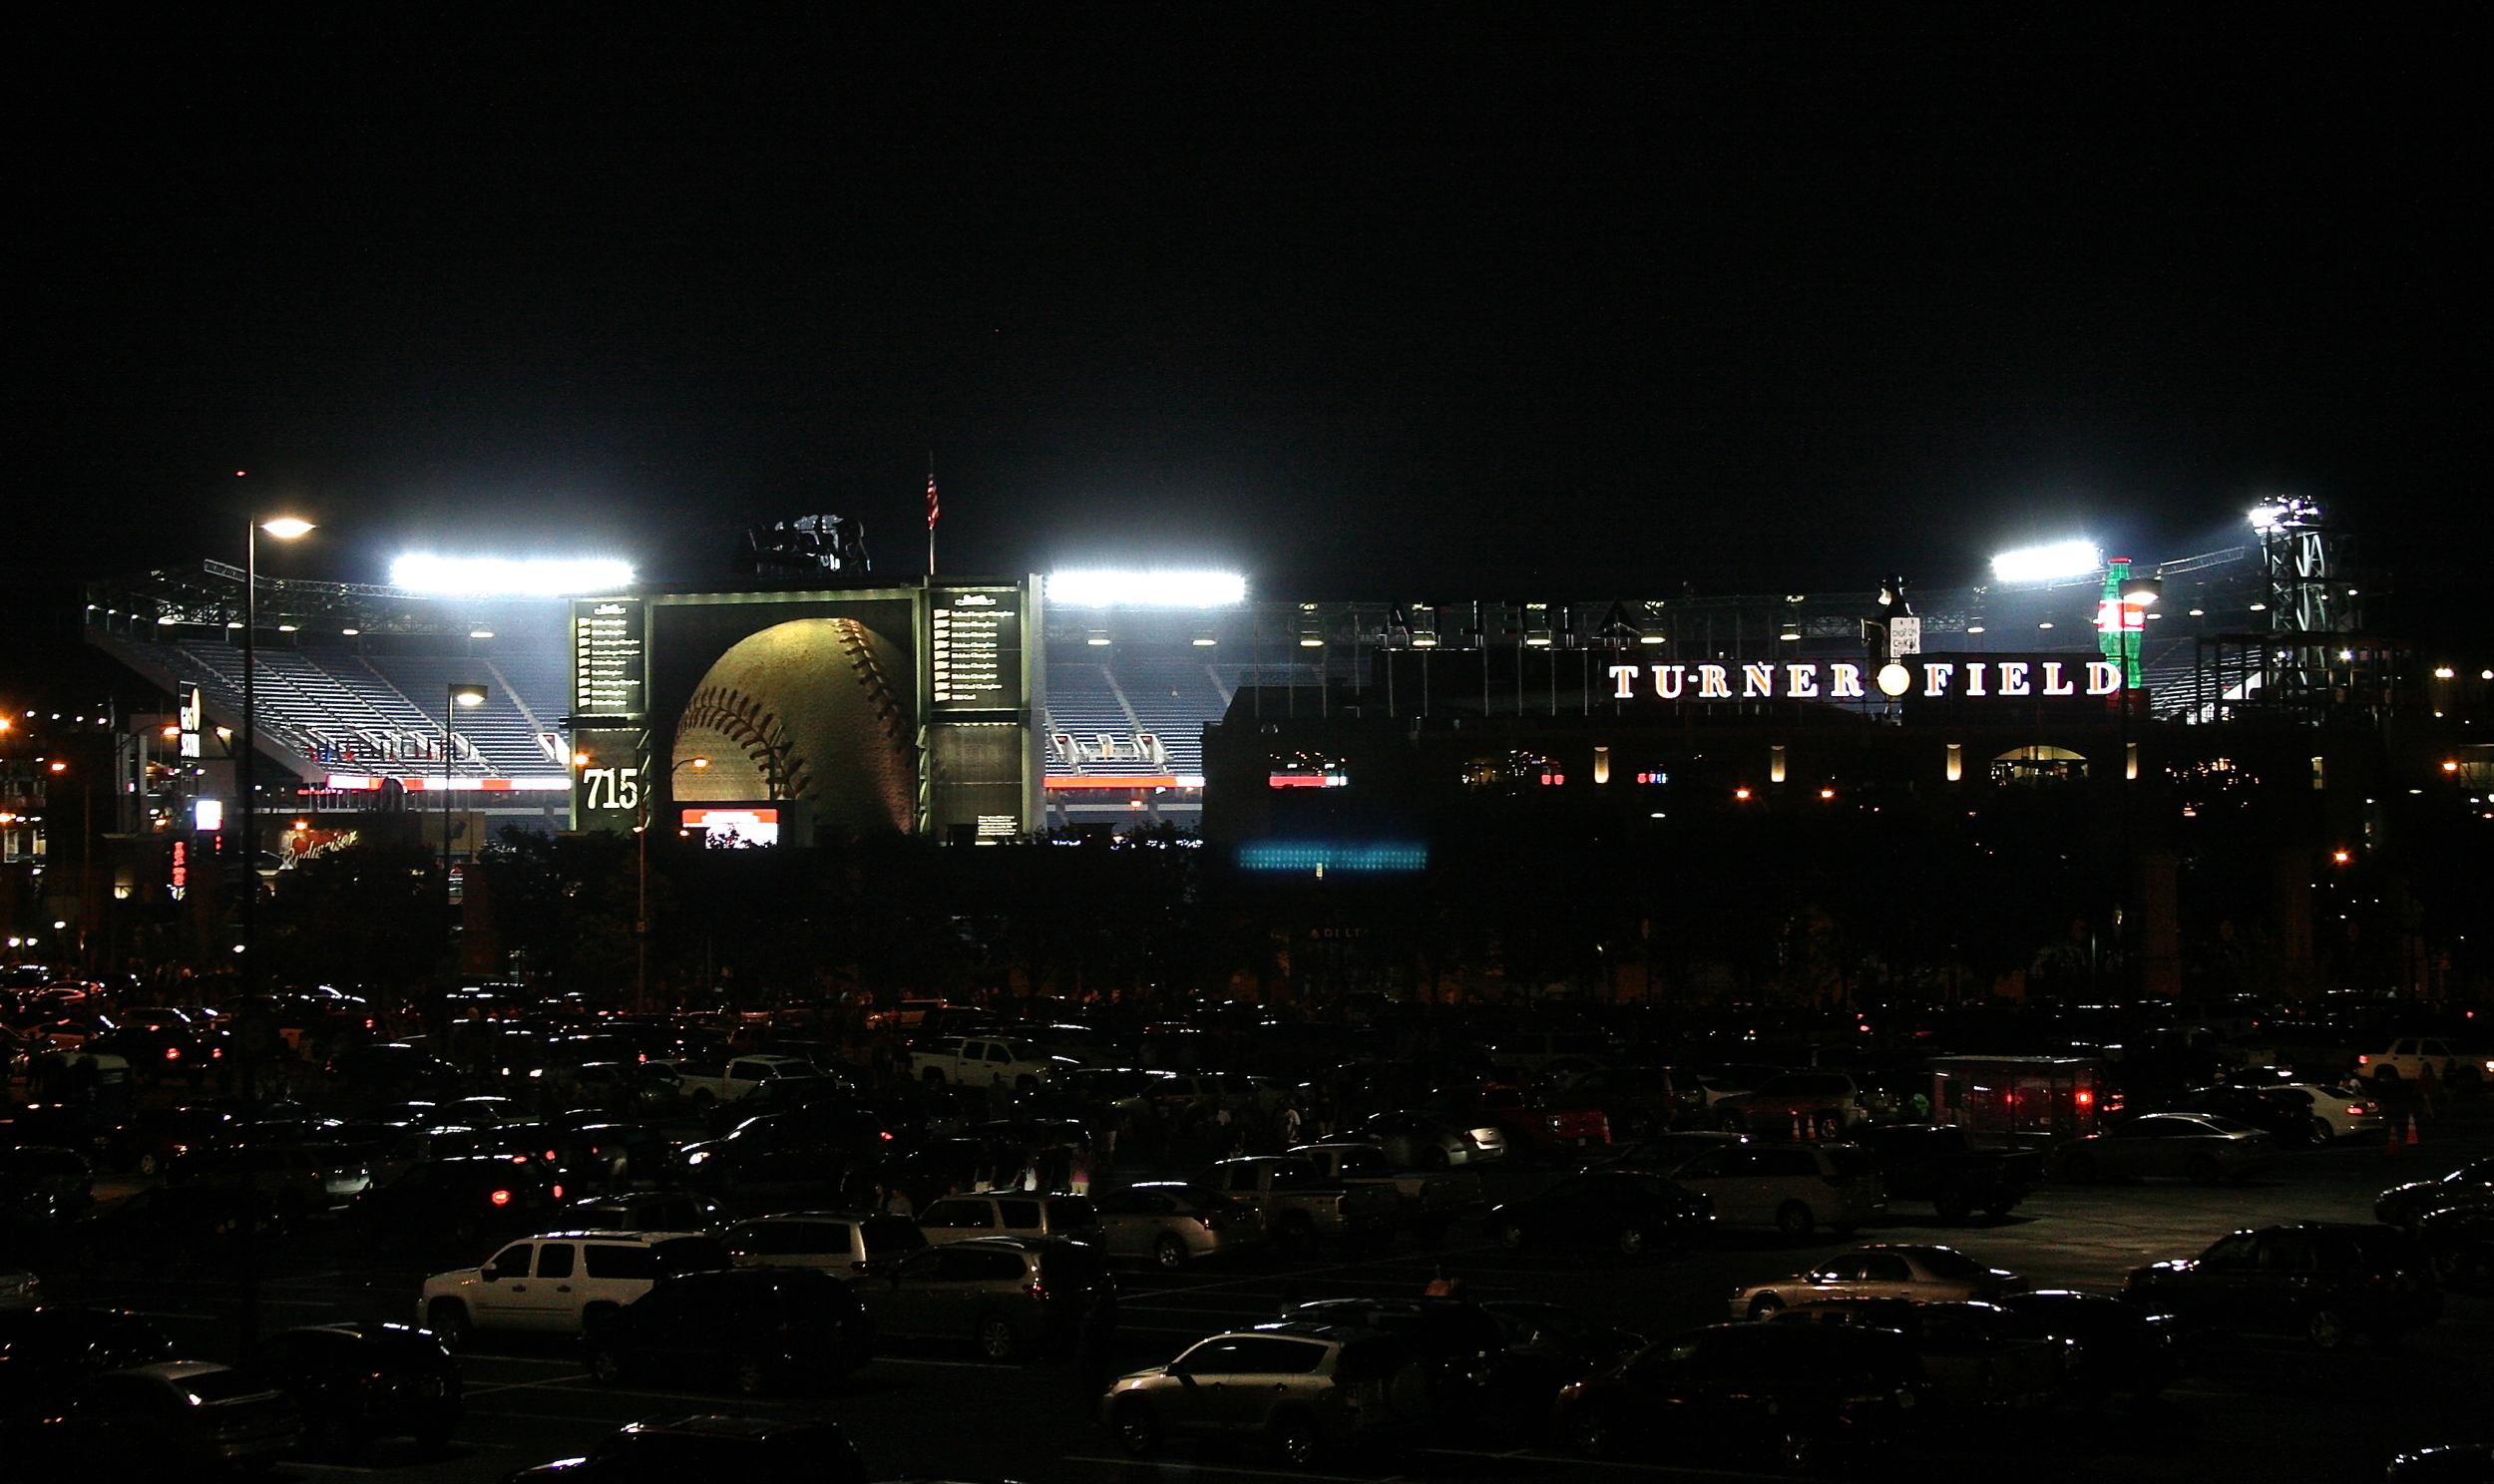 Goodnight Turner Field